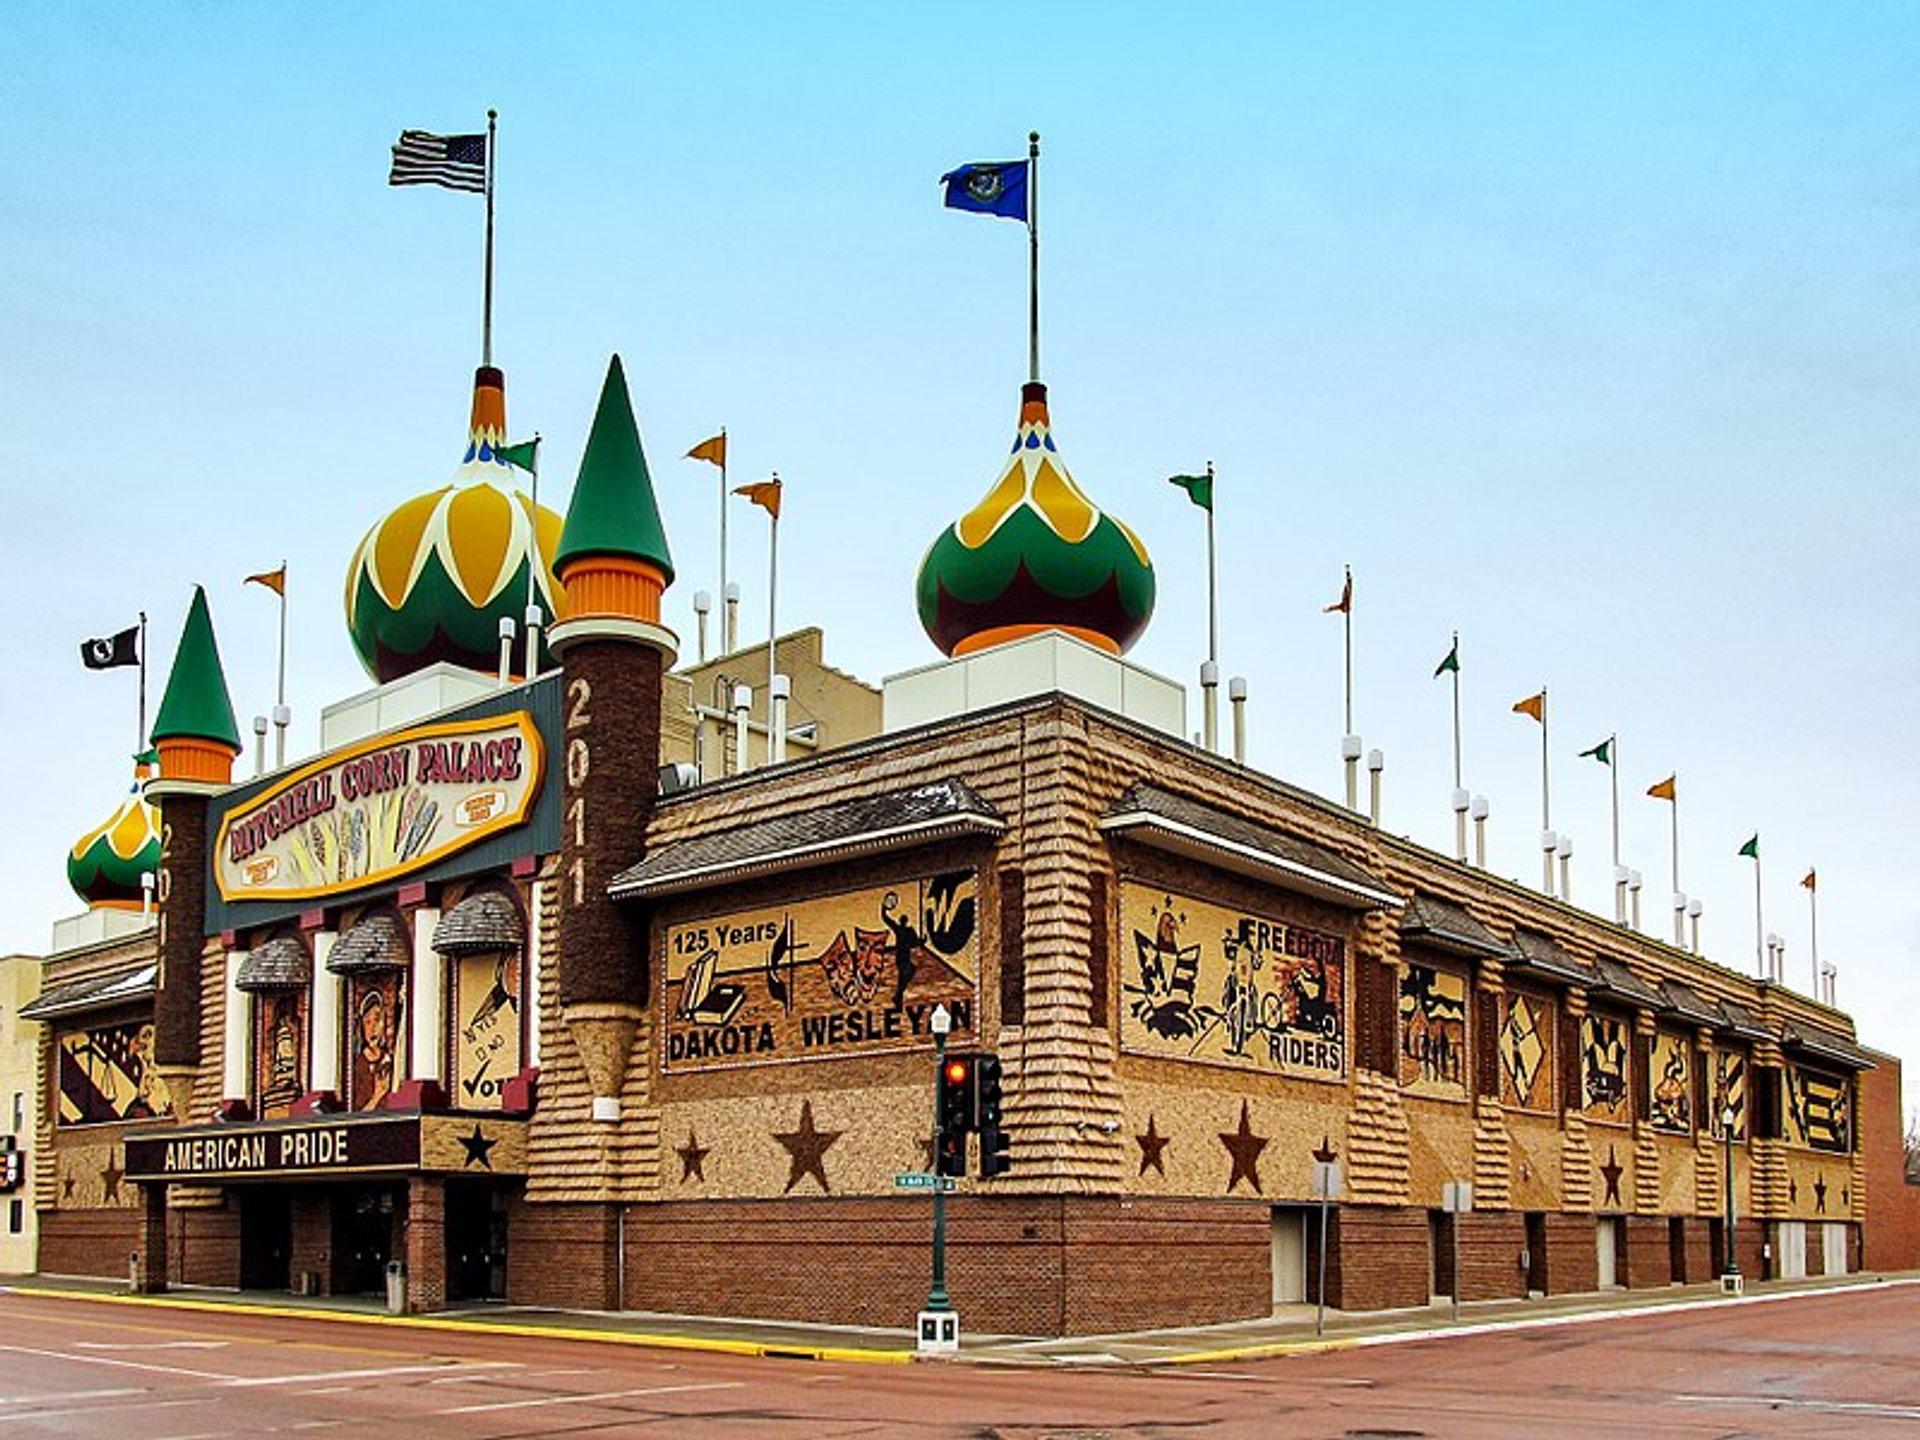 Corn Palace Festival in South Dakota 2020 - Best Time